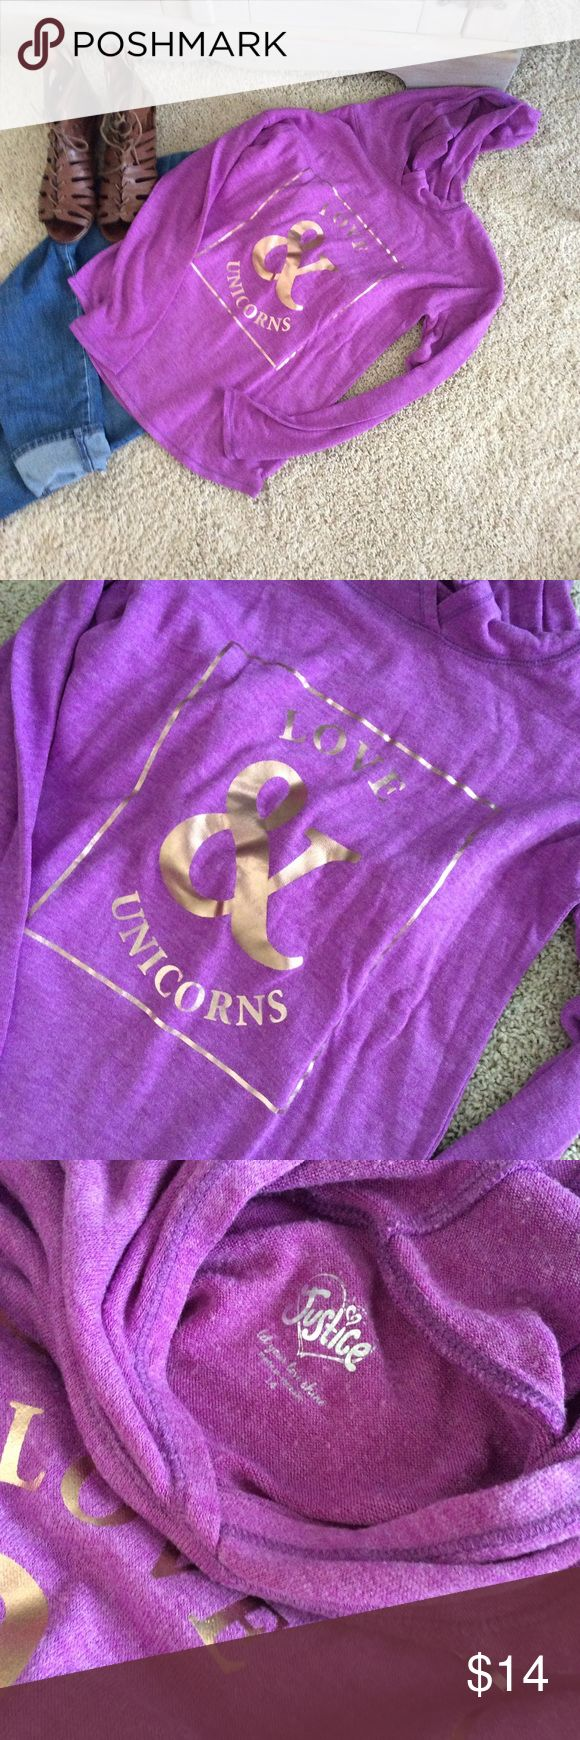 "Love and unicorns hoodie Purple hoodie ""love and unicorns"" Justice Shirts & Tops Sweatshirts & Hoodies"